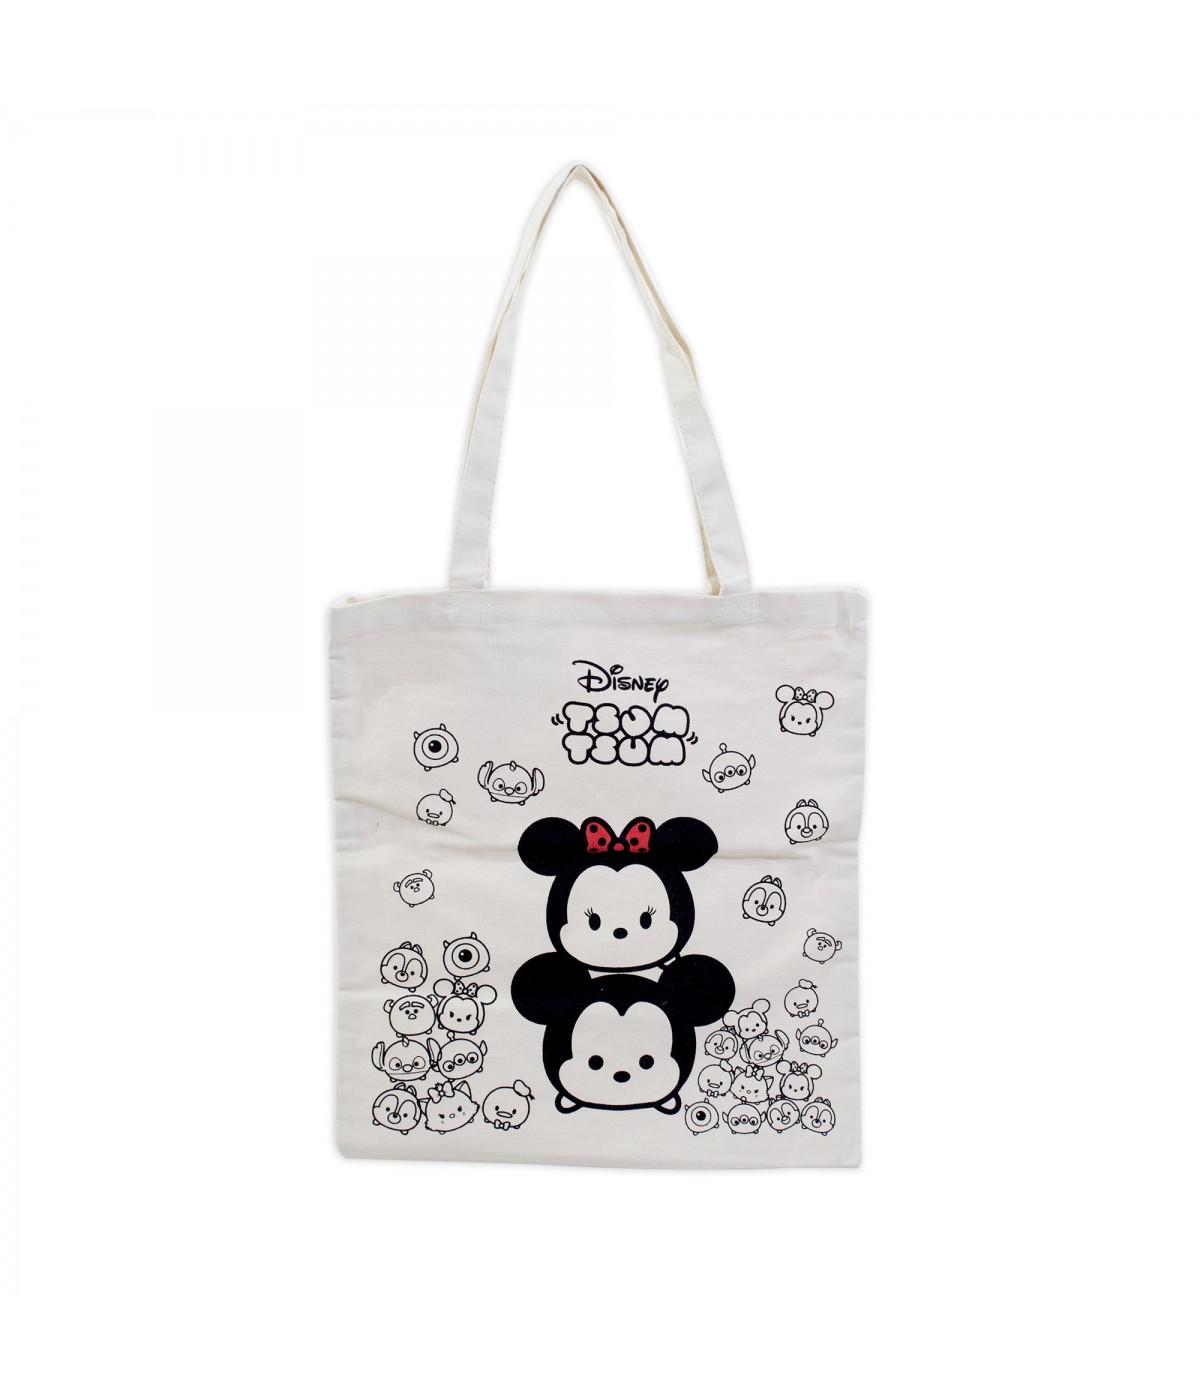 4072afc86d1634 Bolsa Tipo Saco Mickey & Minnie Tsum Tsum - Disney